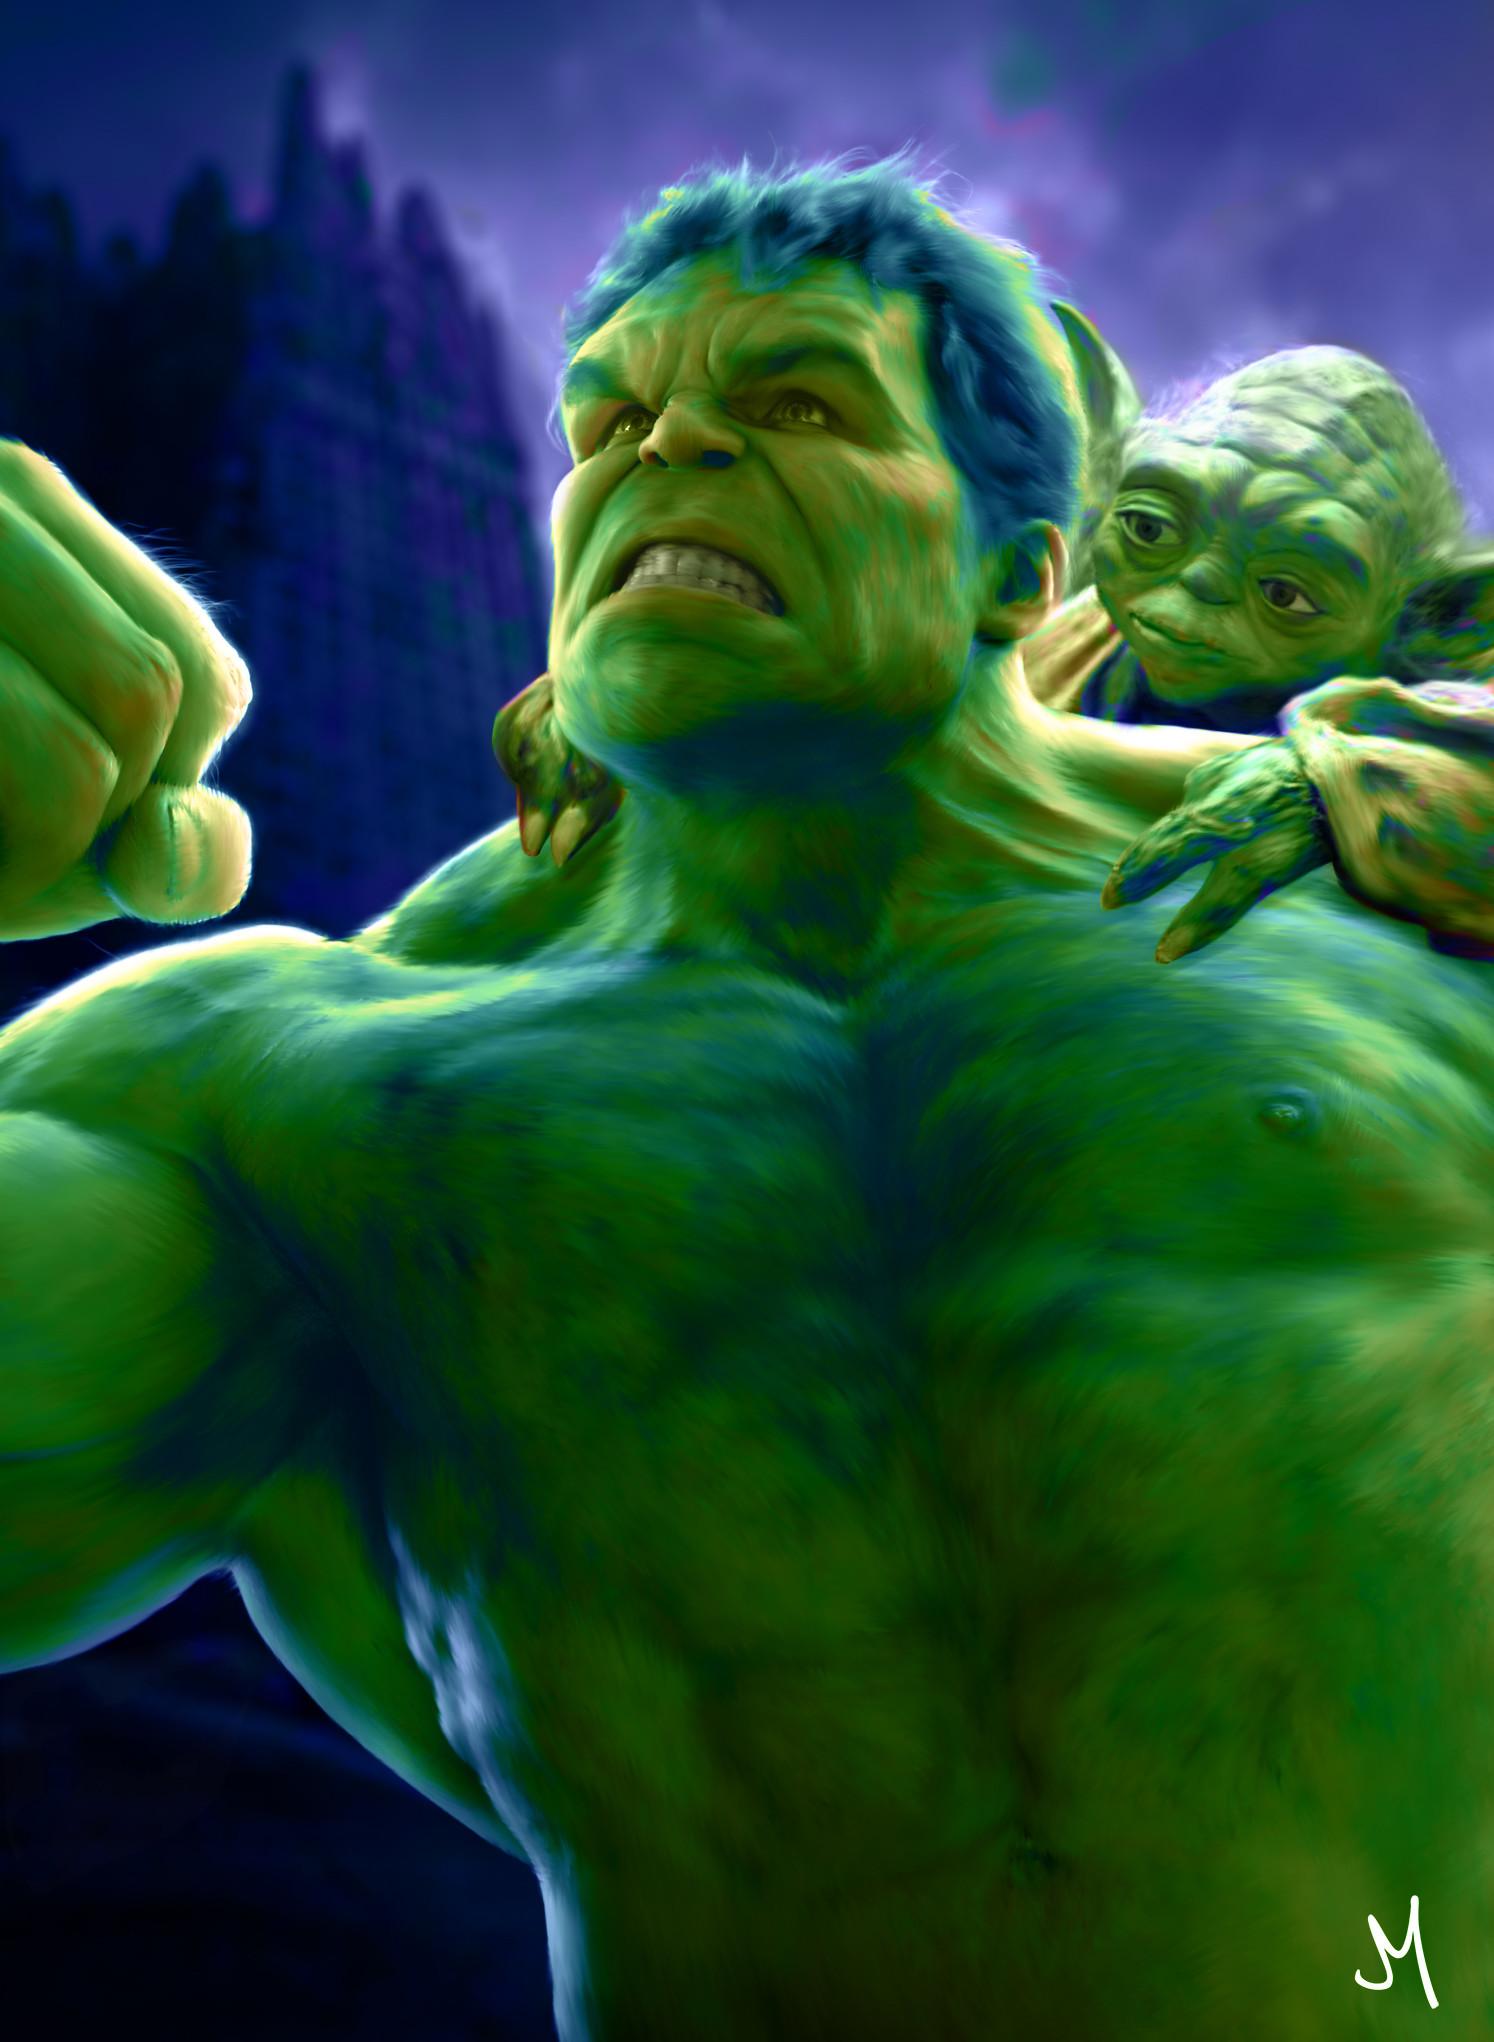 jakub-maslowski-hulk-yoda.jpg?1513607648